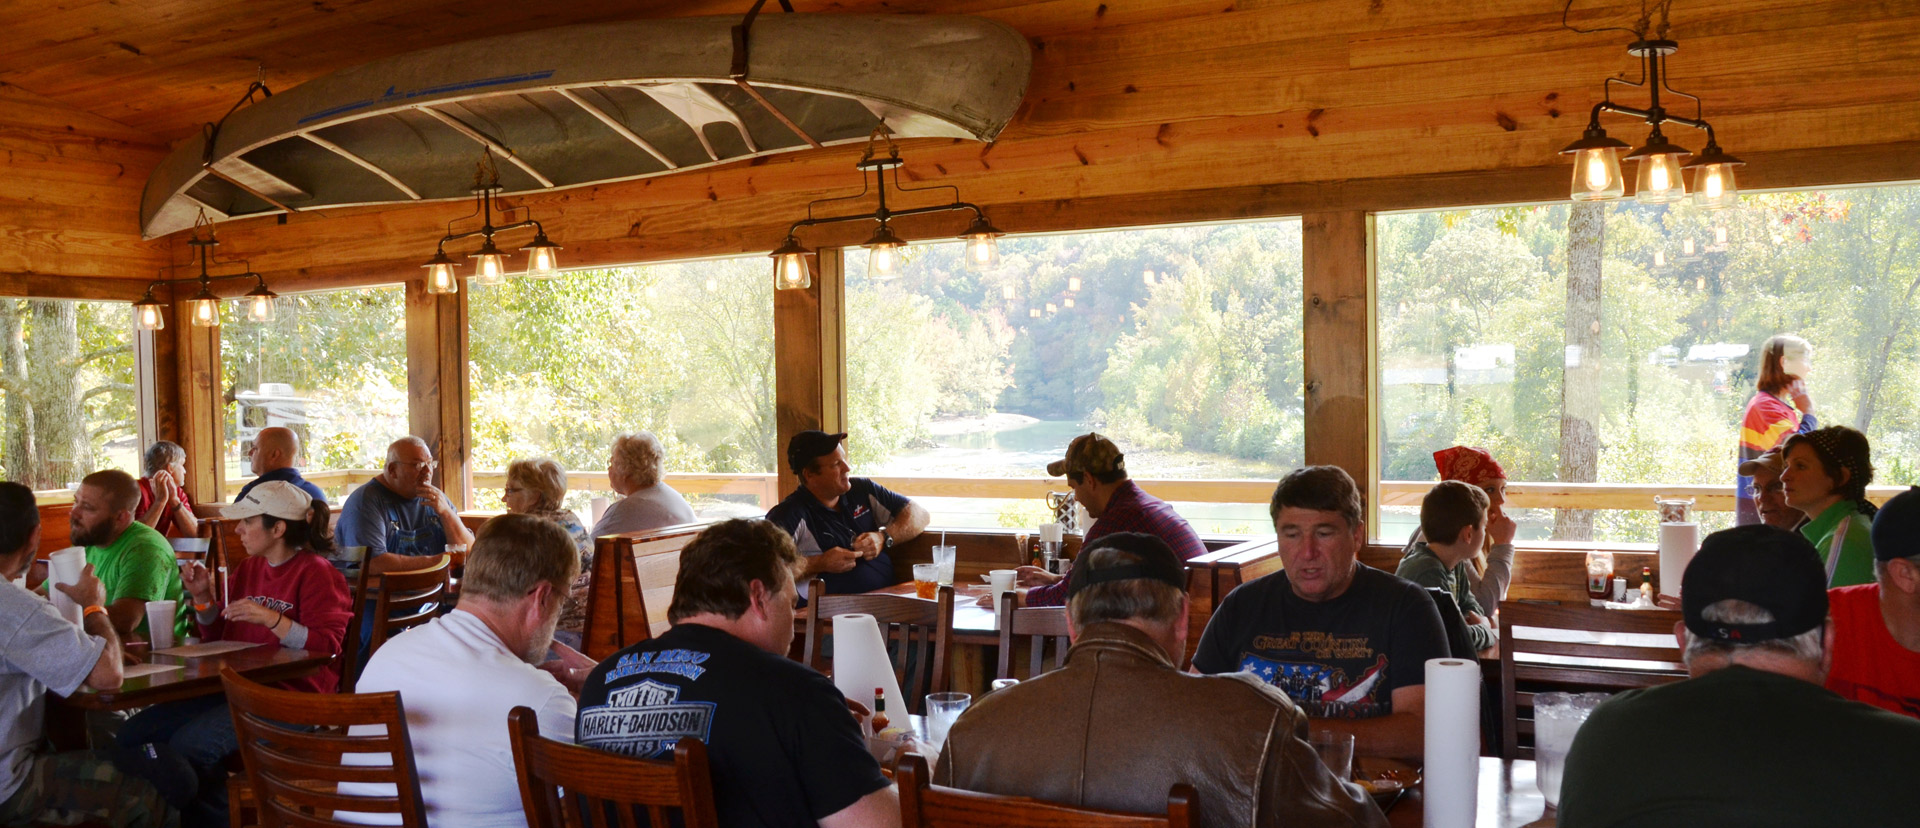 Byrds-Restaurant-on-Mulber - Byrd's Adventure Center